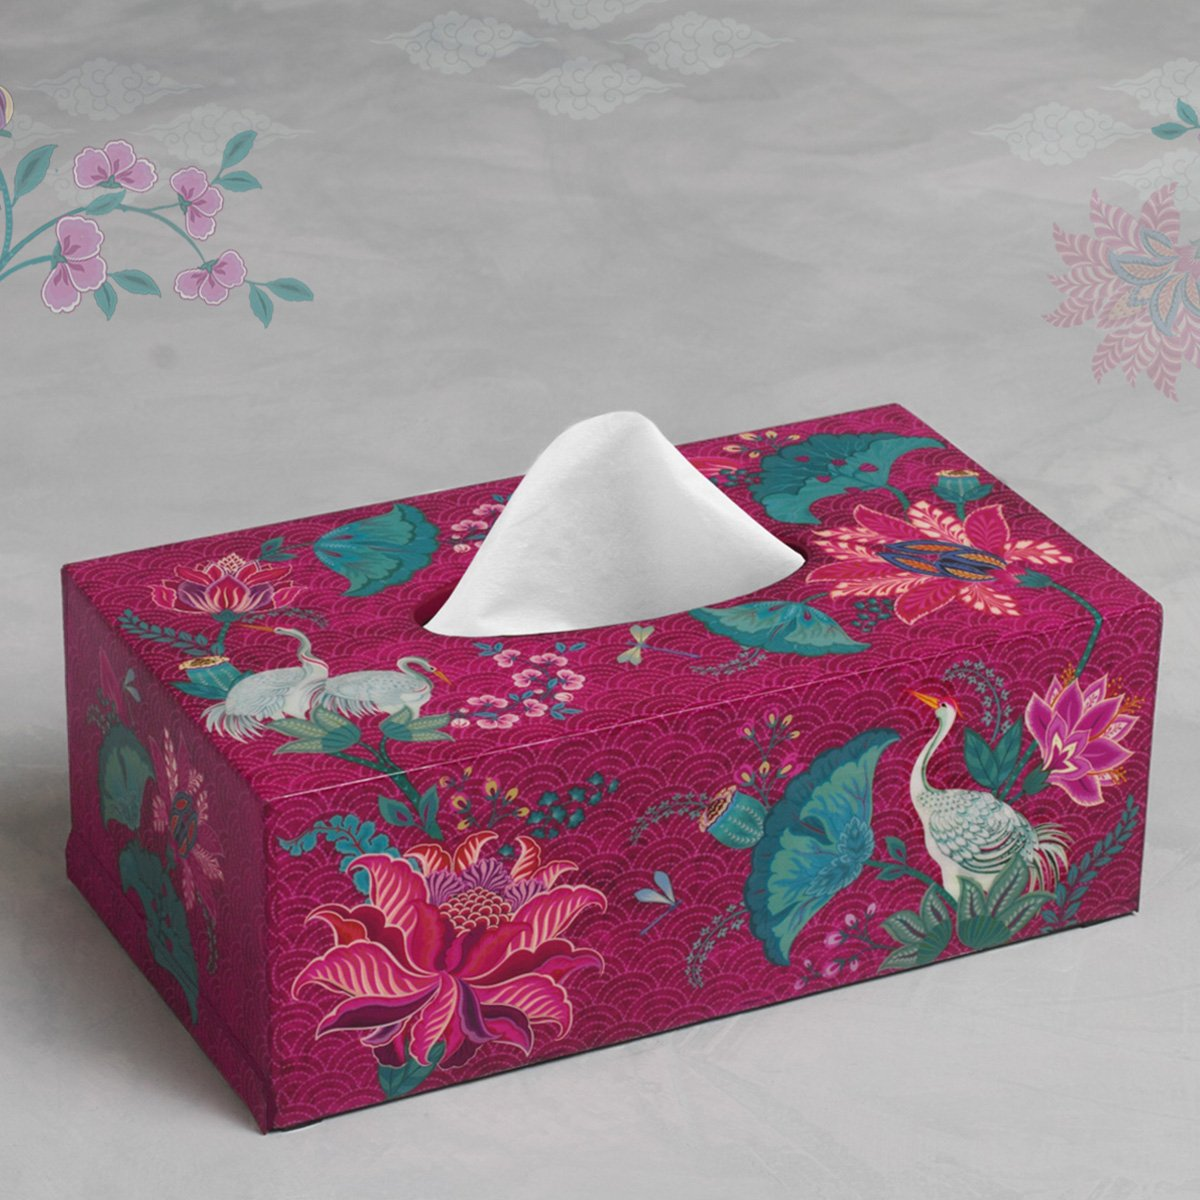 Tissue Box - Ruby